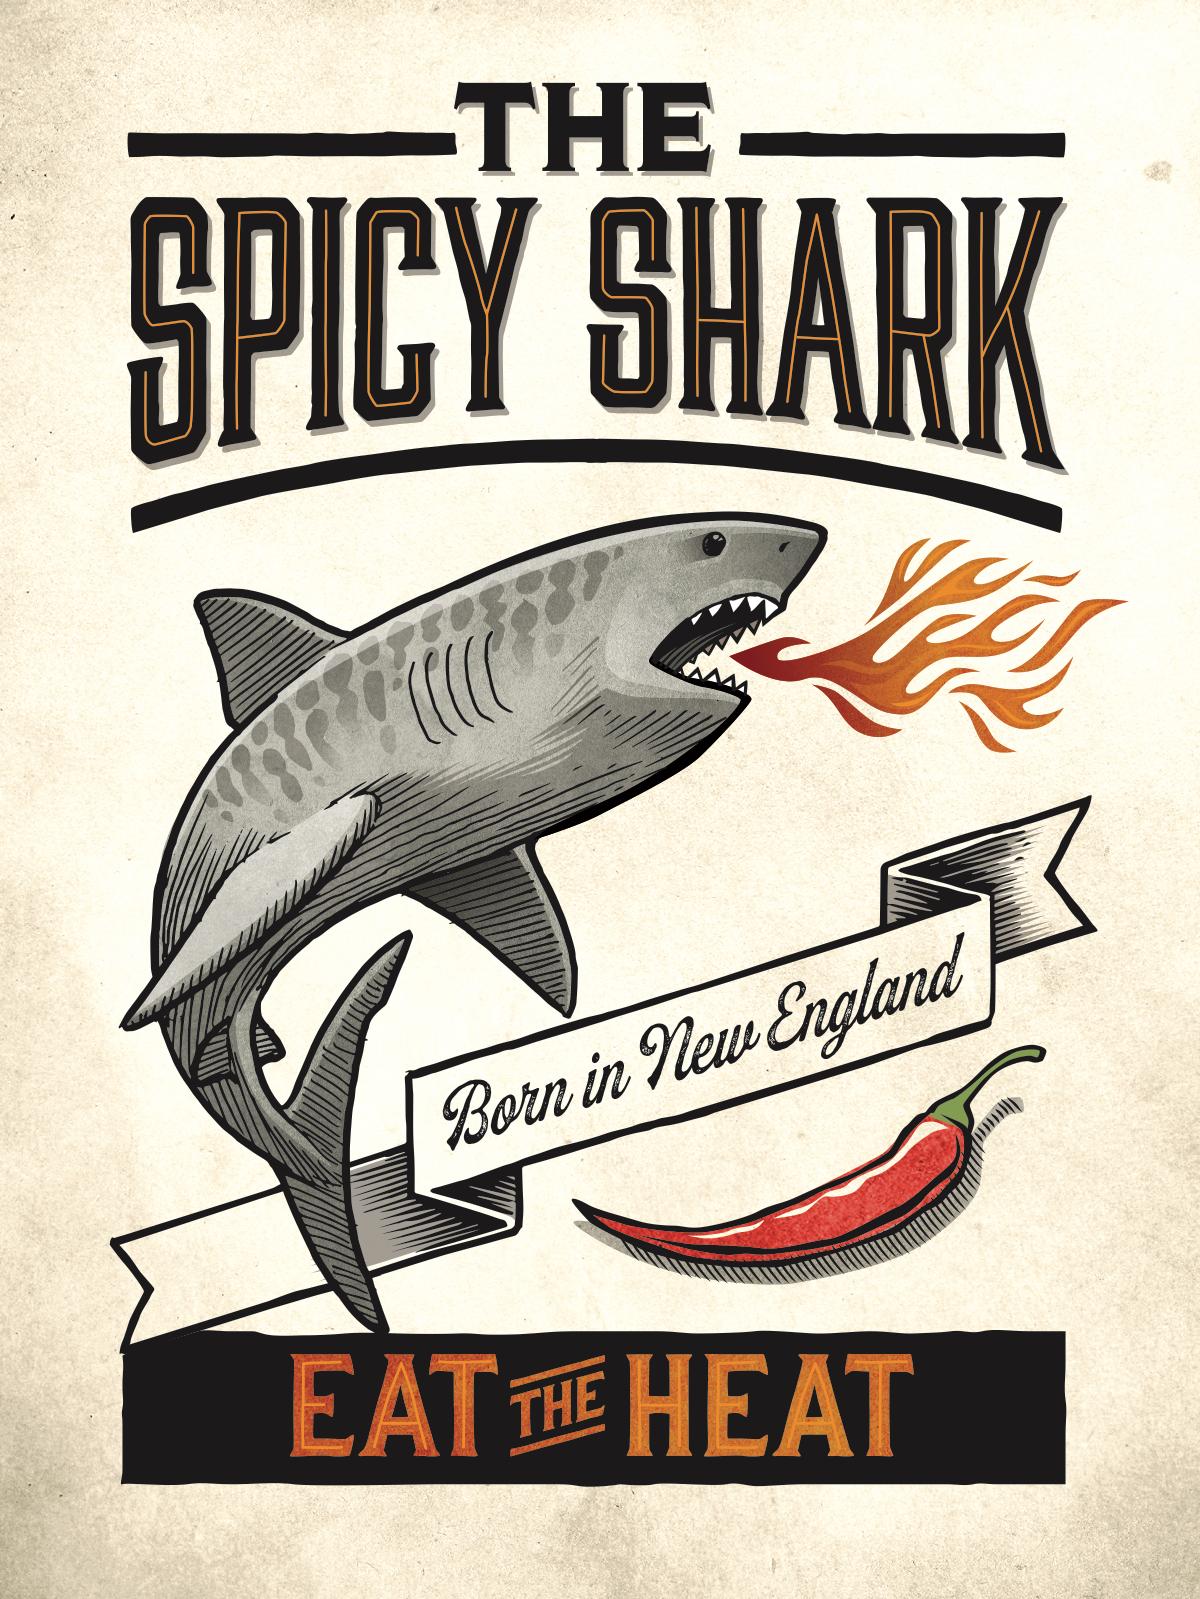 The Spicy Shark - new sharks